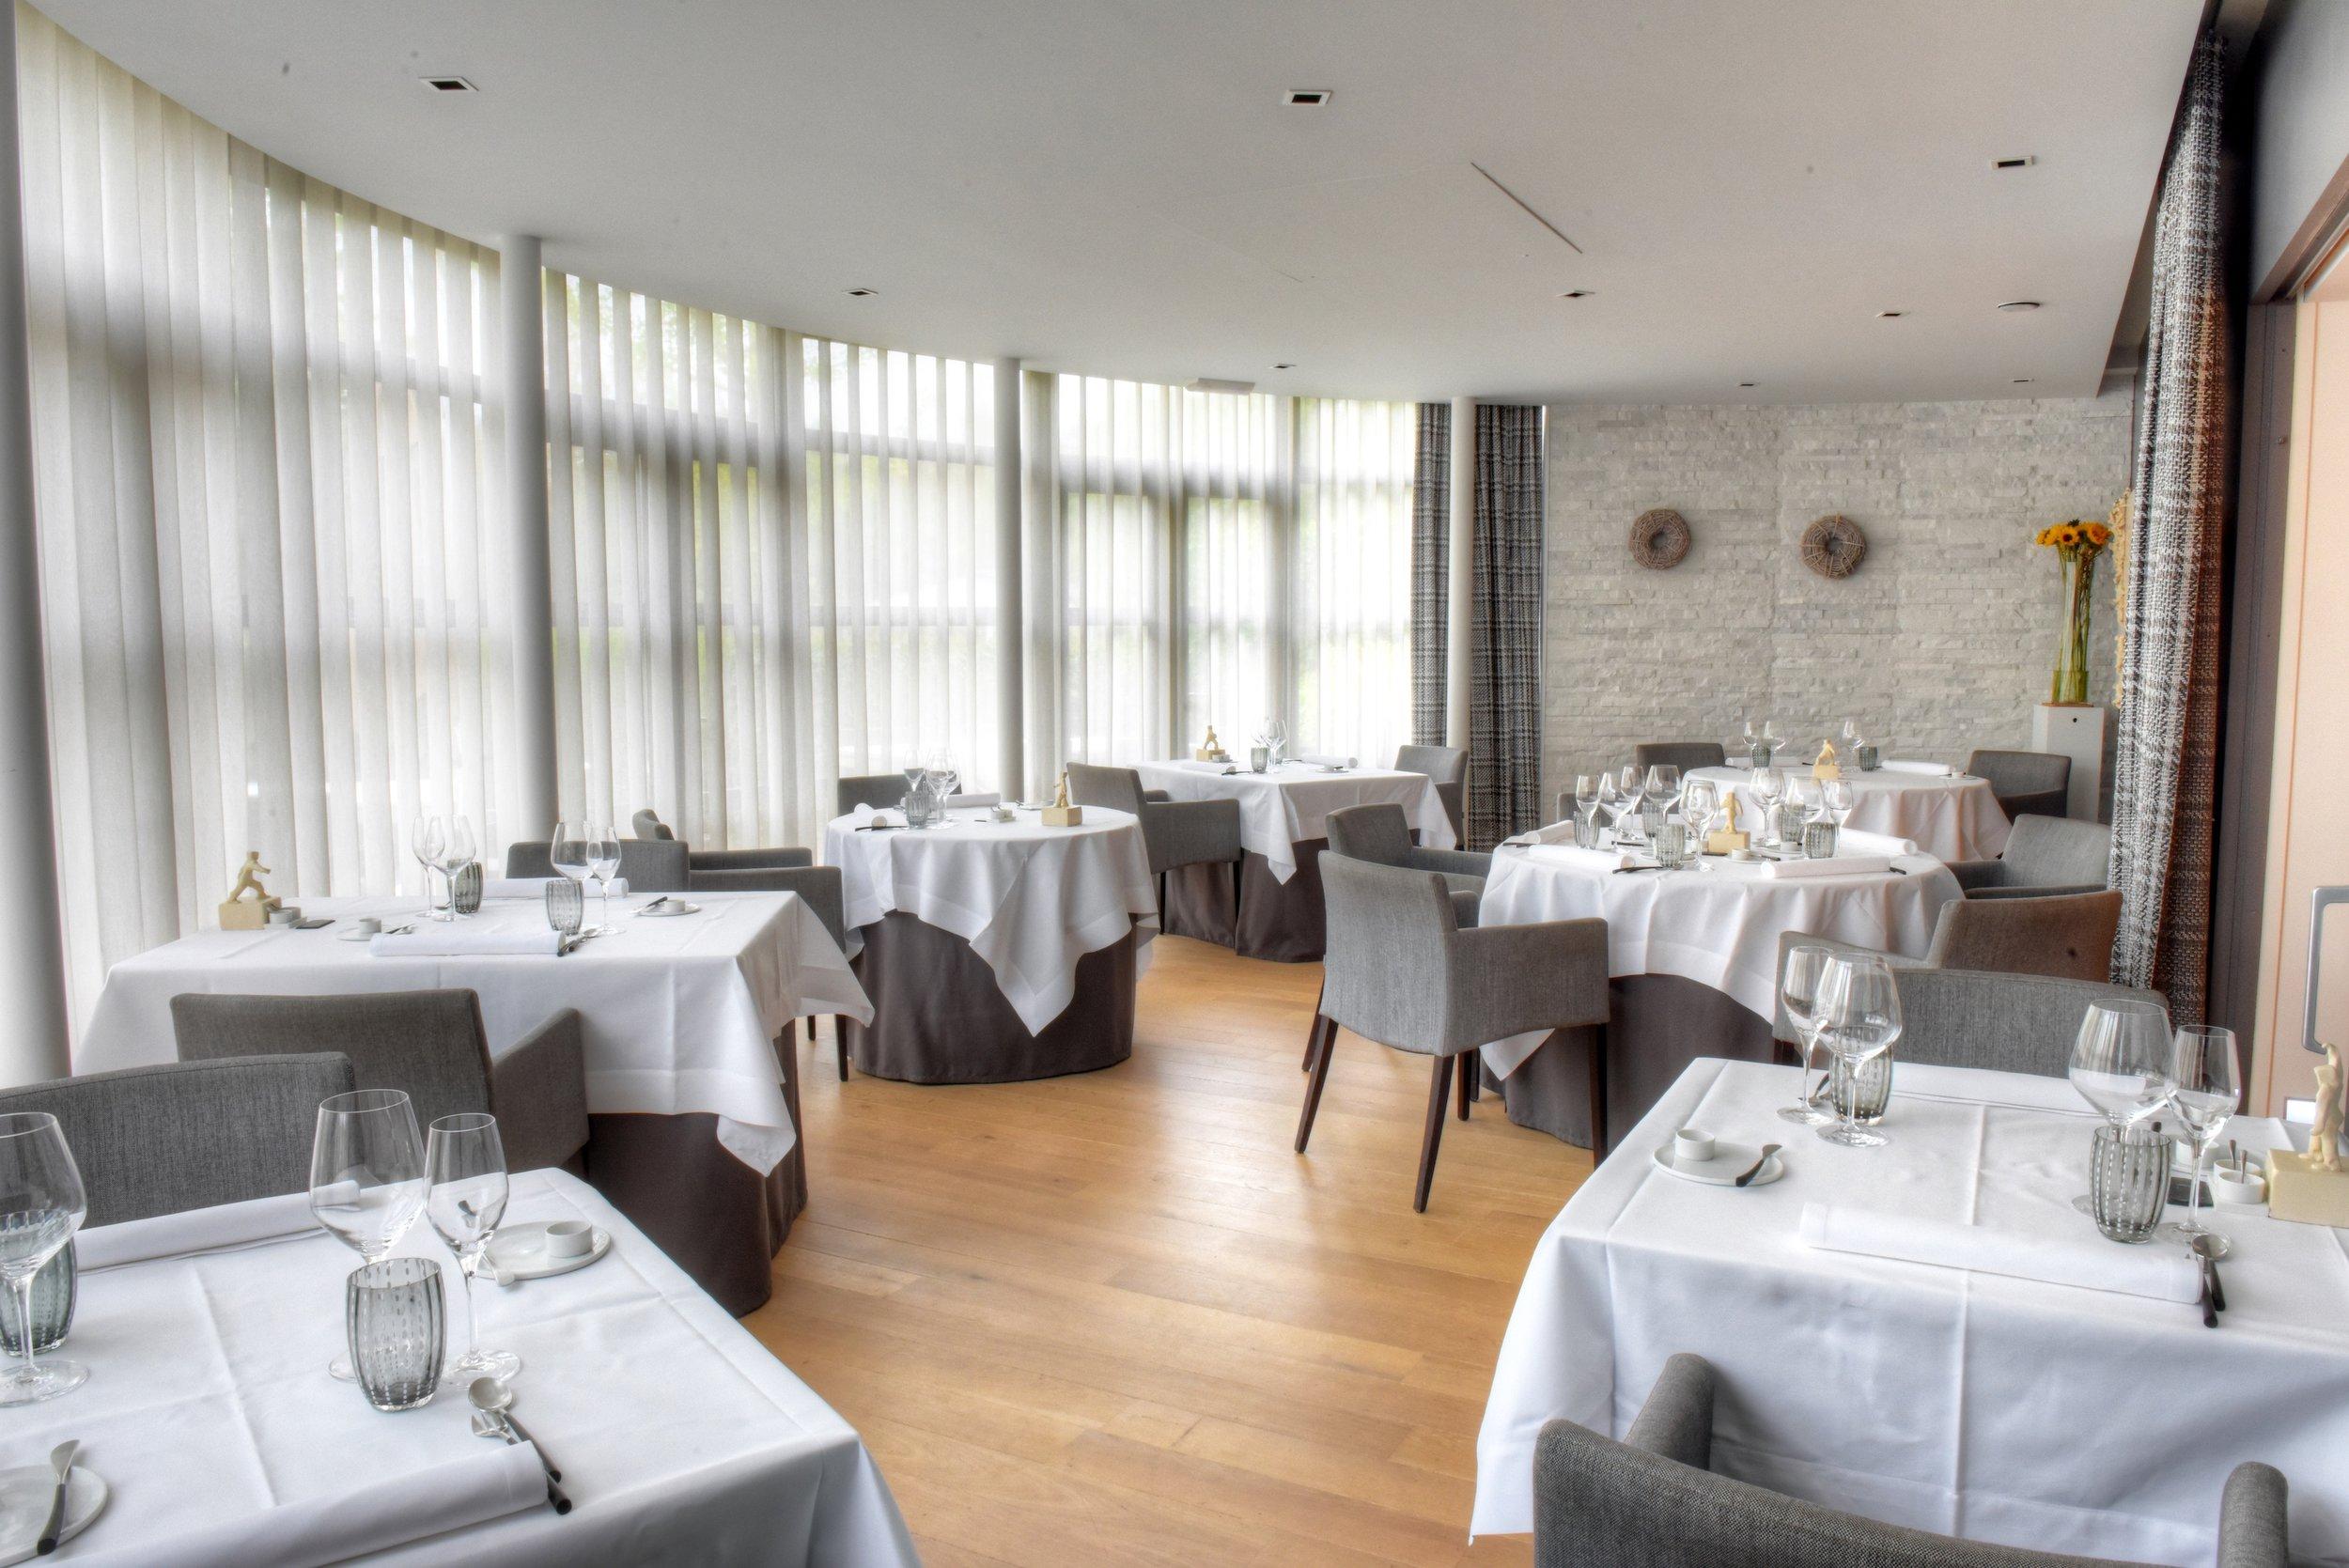 23 arenberg fotograaf restaurant michelin bart albrecht tablefever everlee Egenhoven 0004.jpg